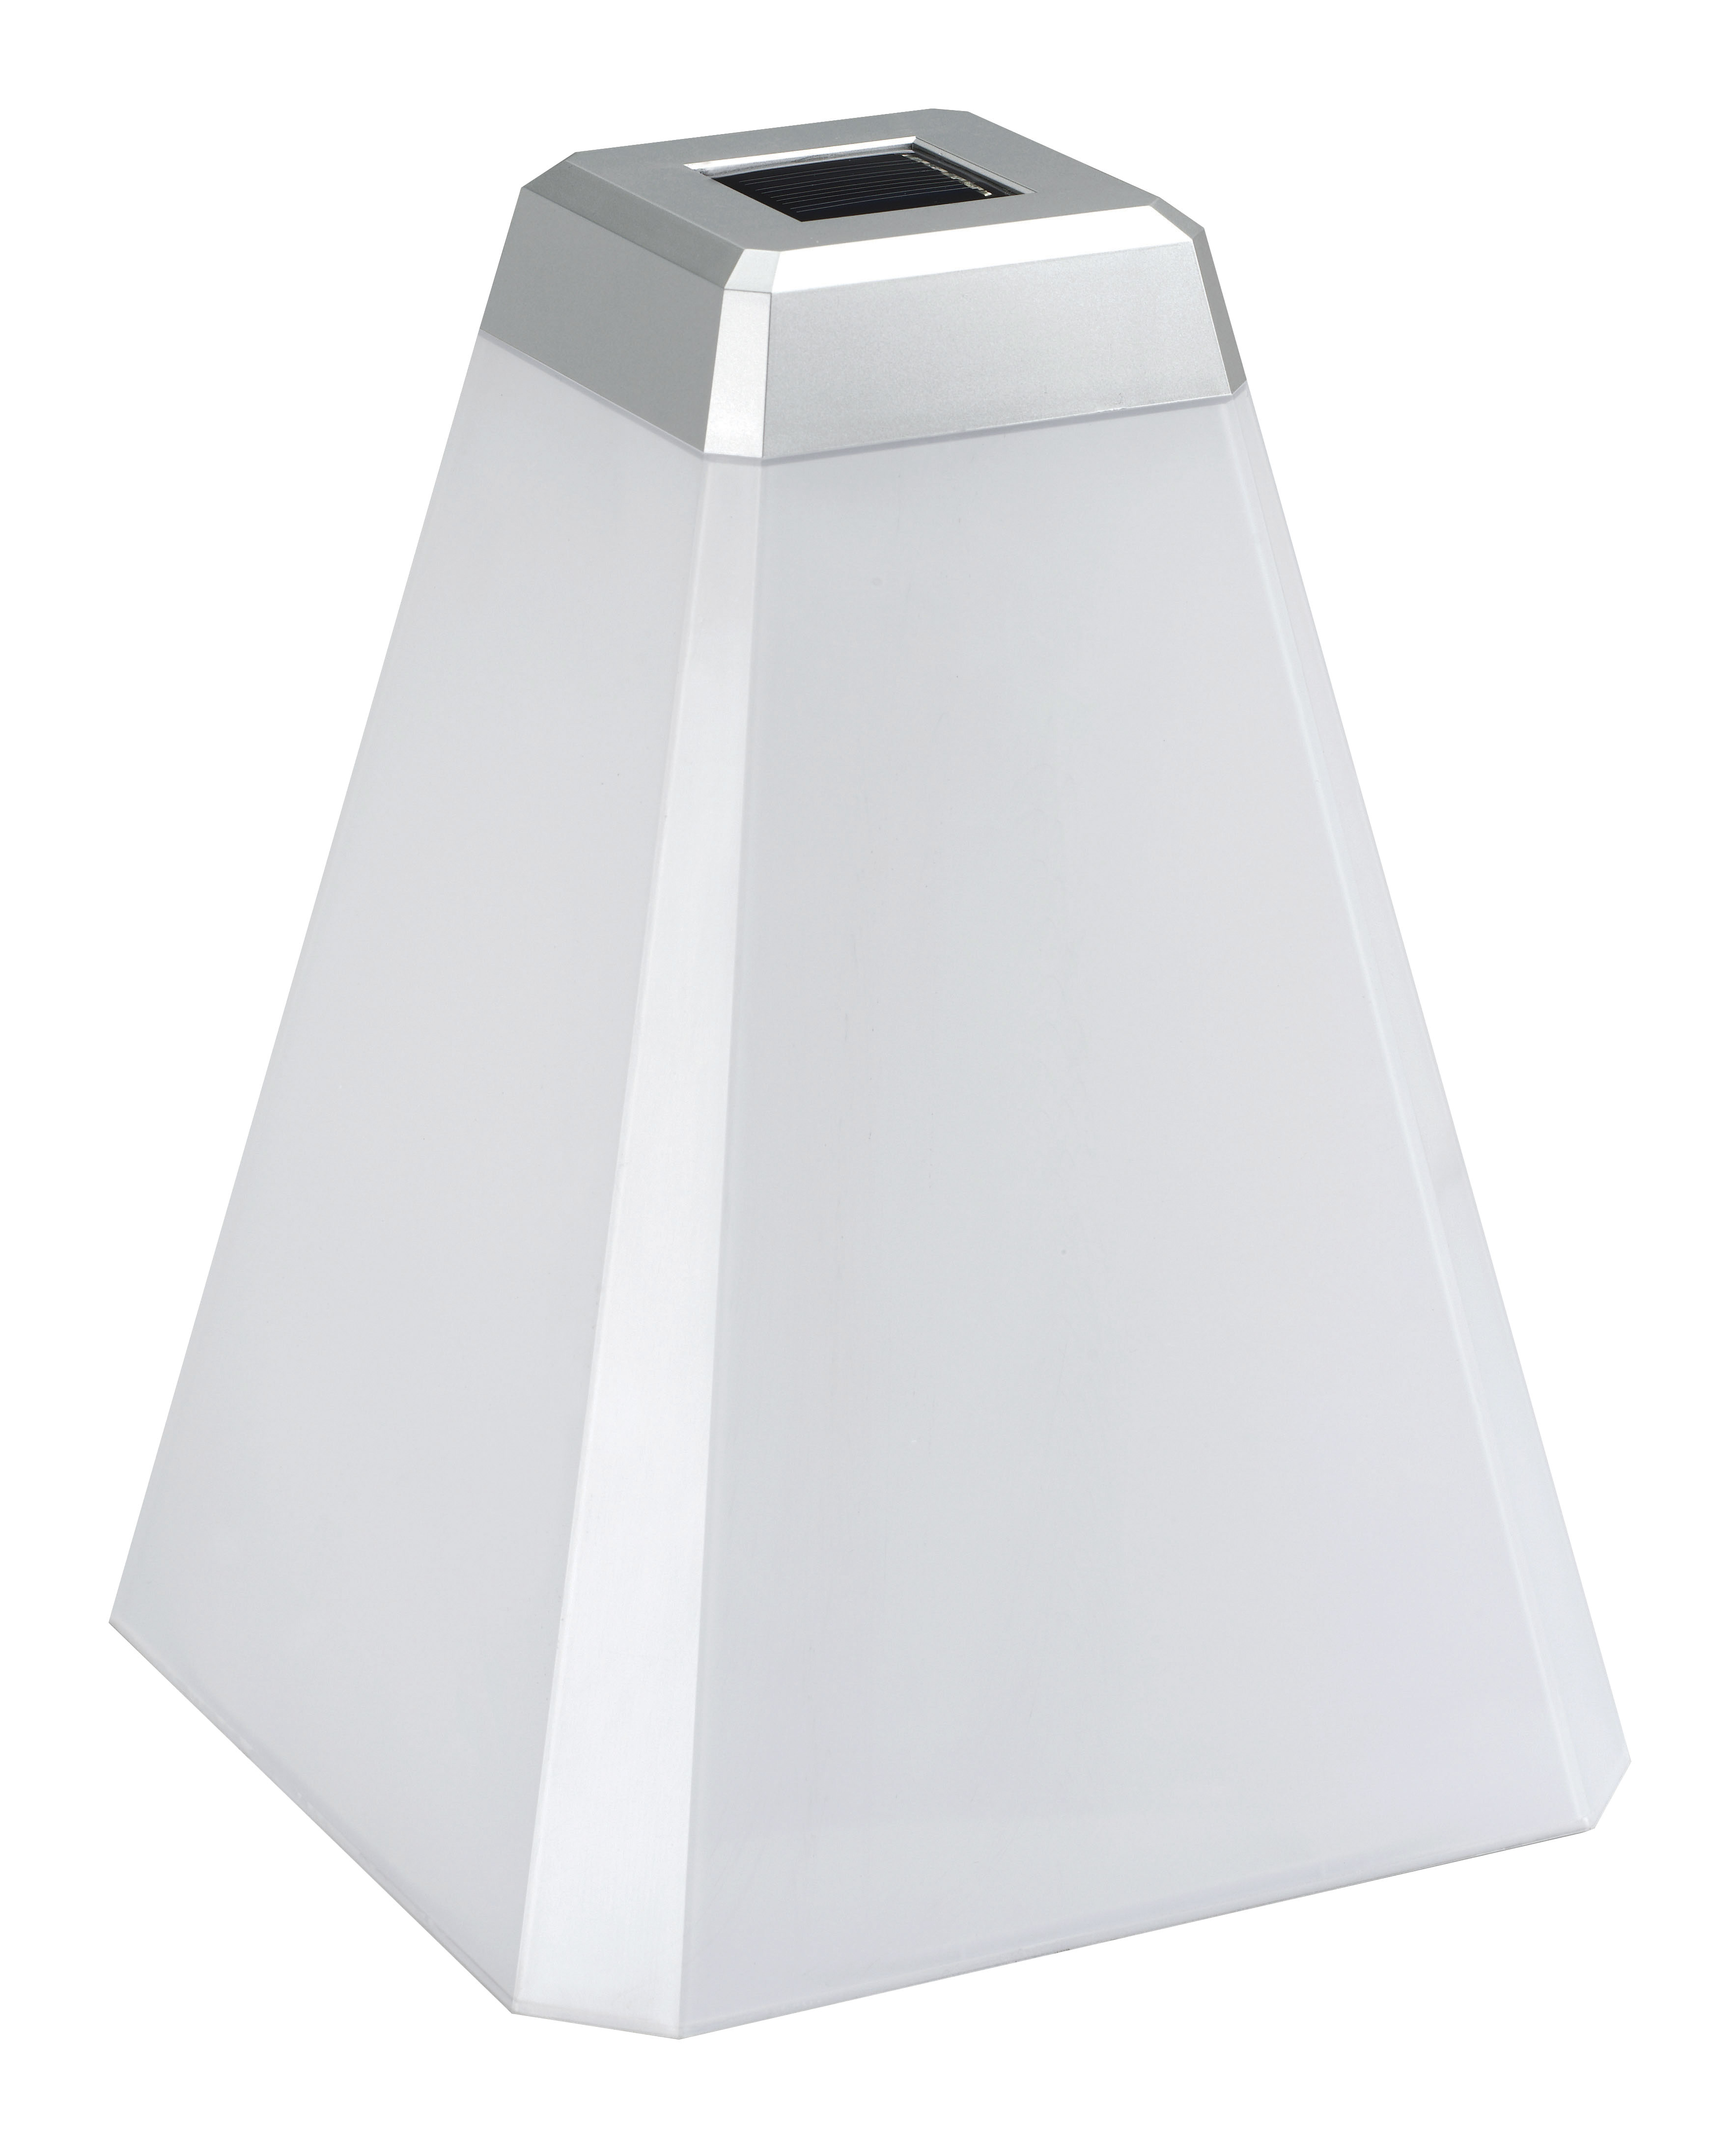 lampe solaire d corative architectural lampe solaire design objetsolaire. Black Bedroom Furniture Sets. Home Design Ideas